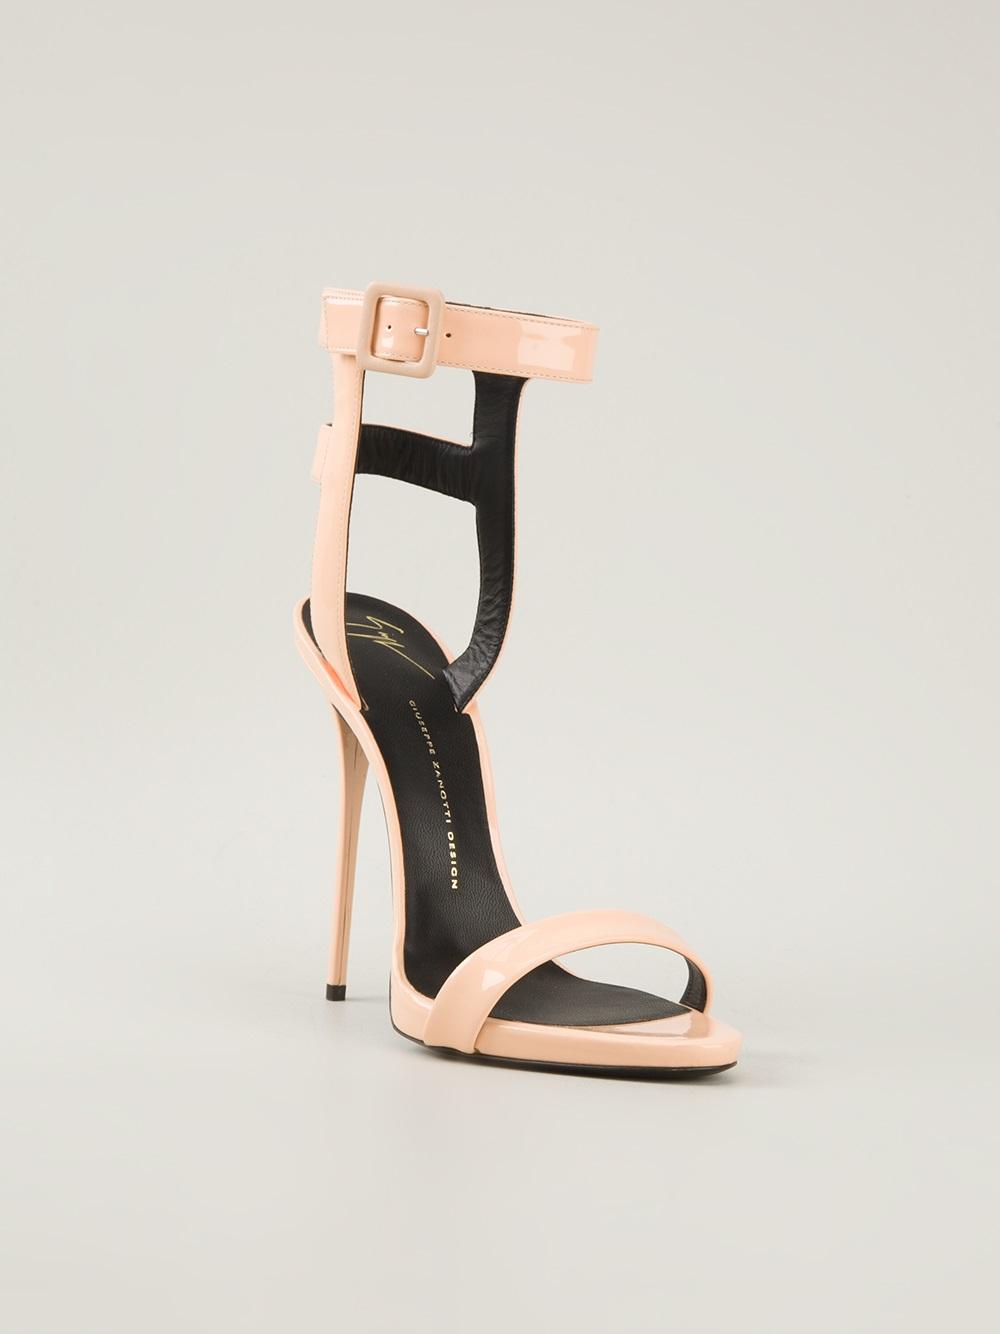 3258418f0493 ... denmark giuseppe zanotti cage sandals in pink lyst d6bca fe0b6